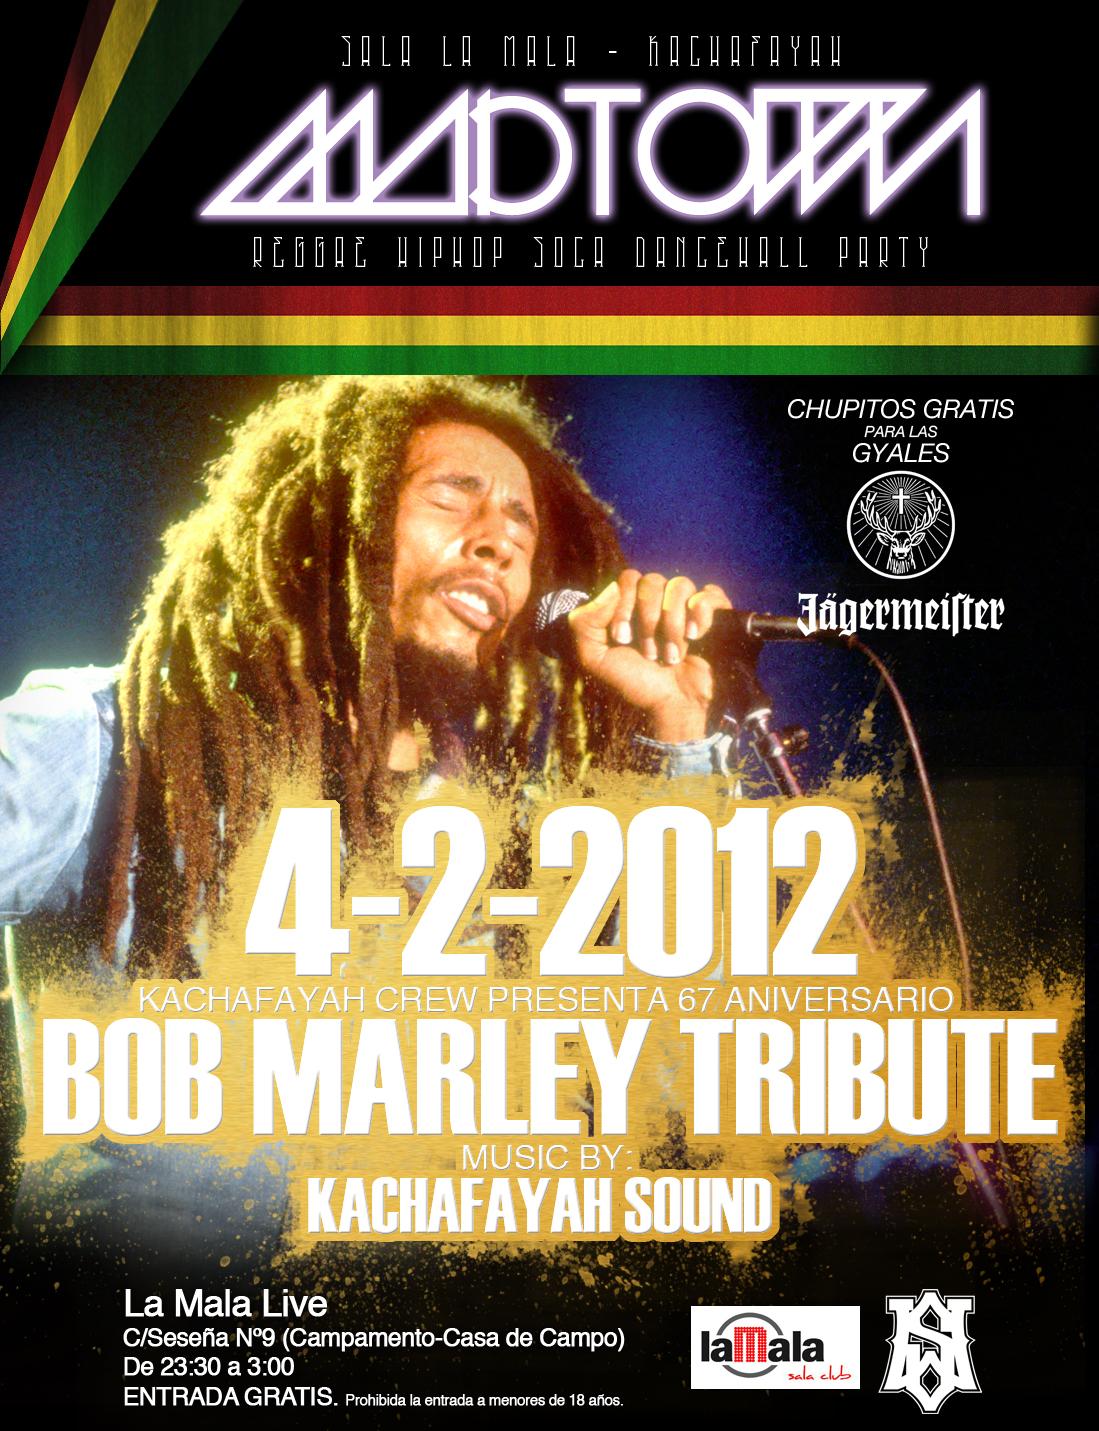 4-2-2012 BOB MARLEY TRIBUTE@SALA LA MALA Febrero_bob_marley_tribut+copia